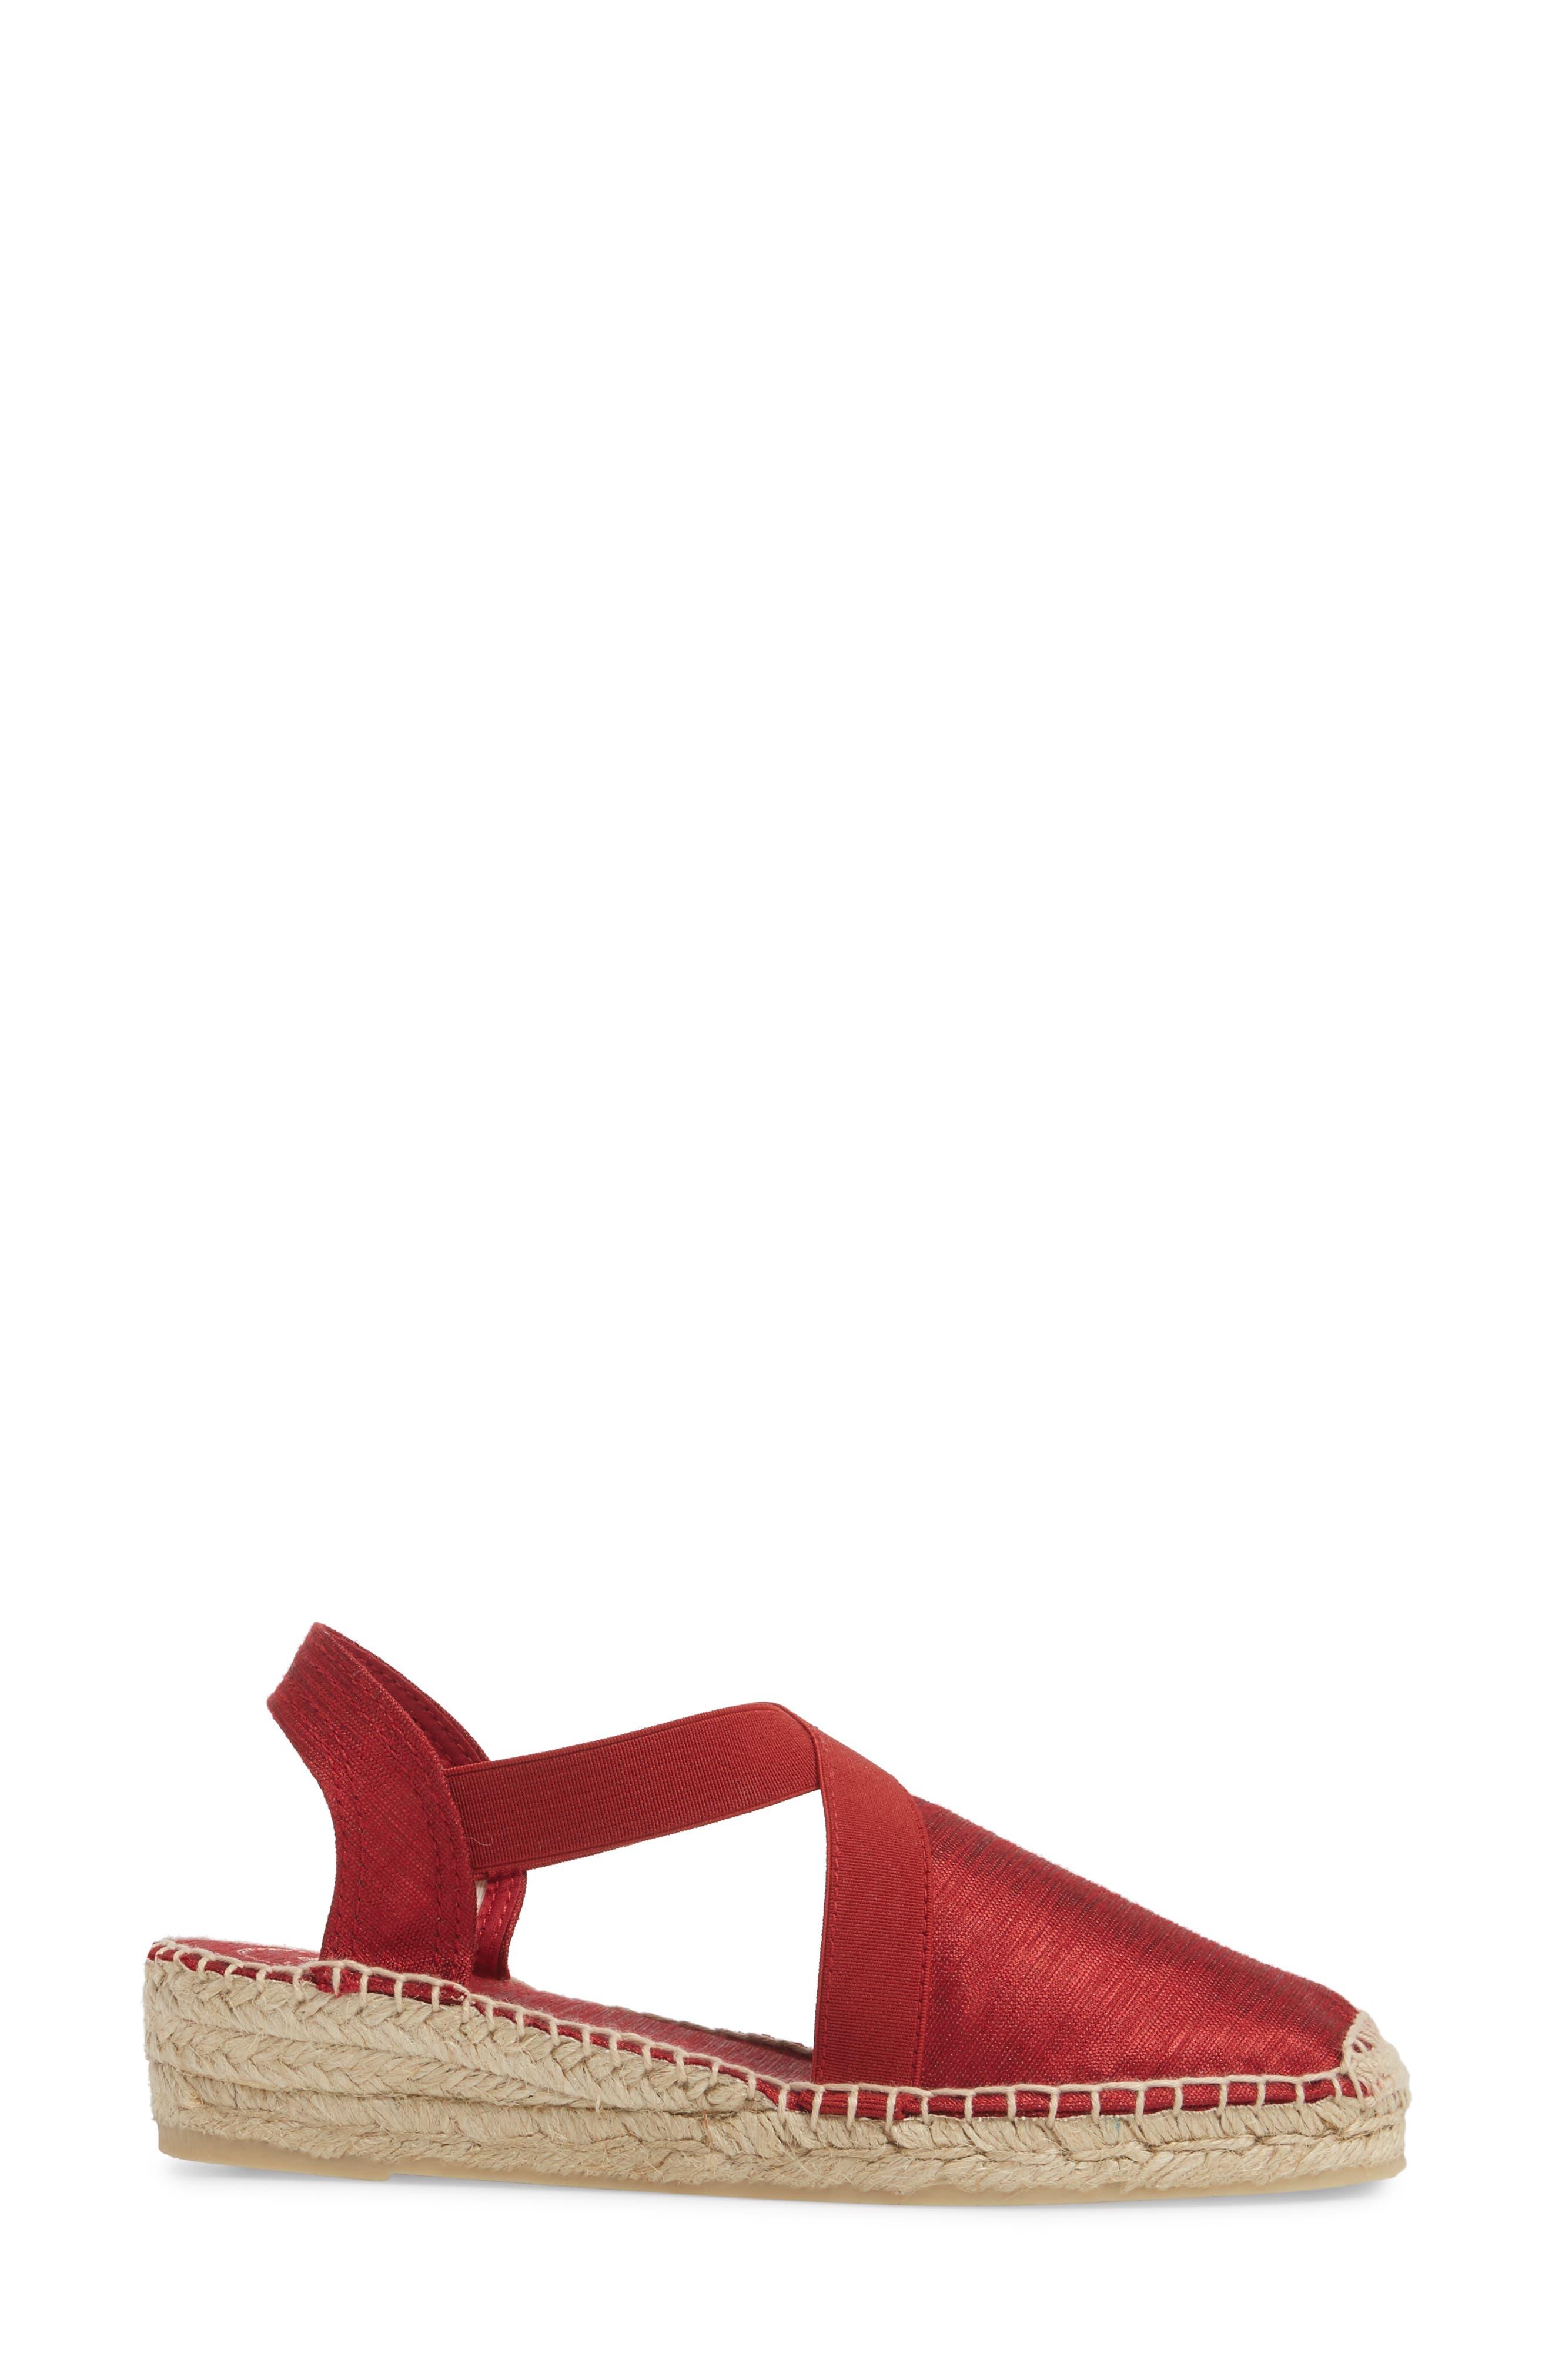 'Vic' Espadrille Slingback Sandal,                             Alternate thumbnail 3, color,                             Red Fabric